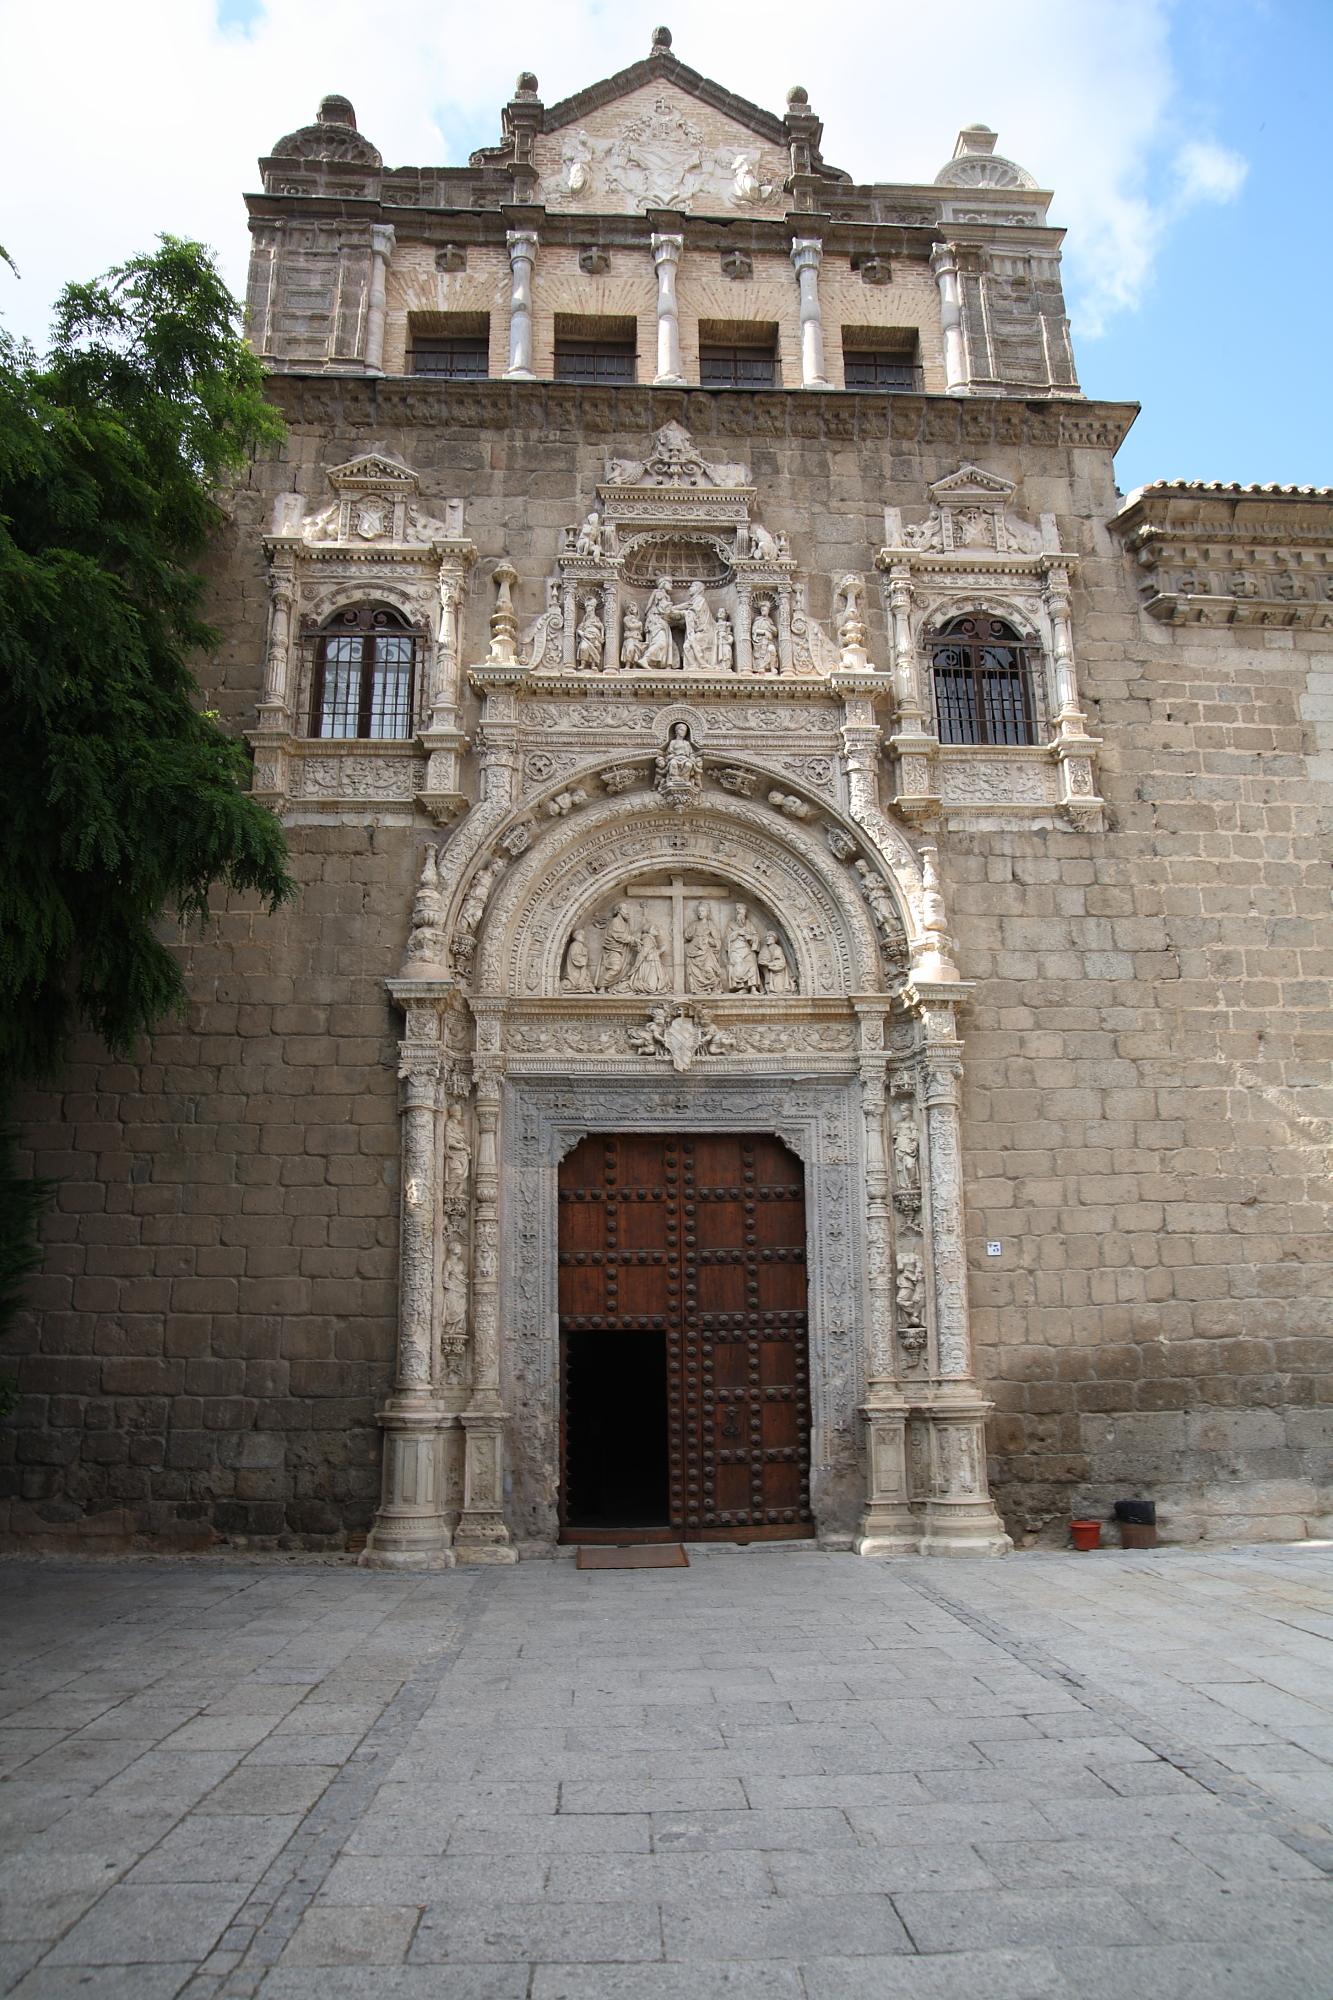 File:Museo de Santa Cruz Toledo.jpg - Wikimedia Commons